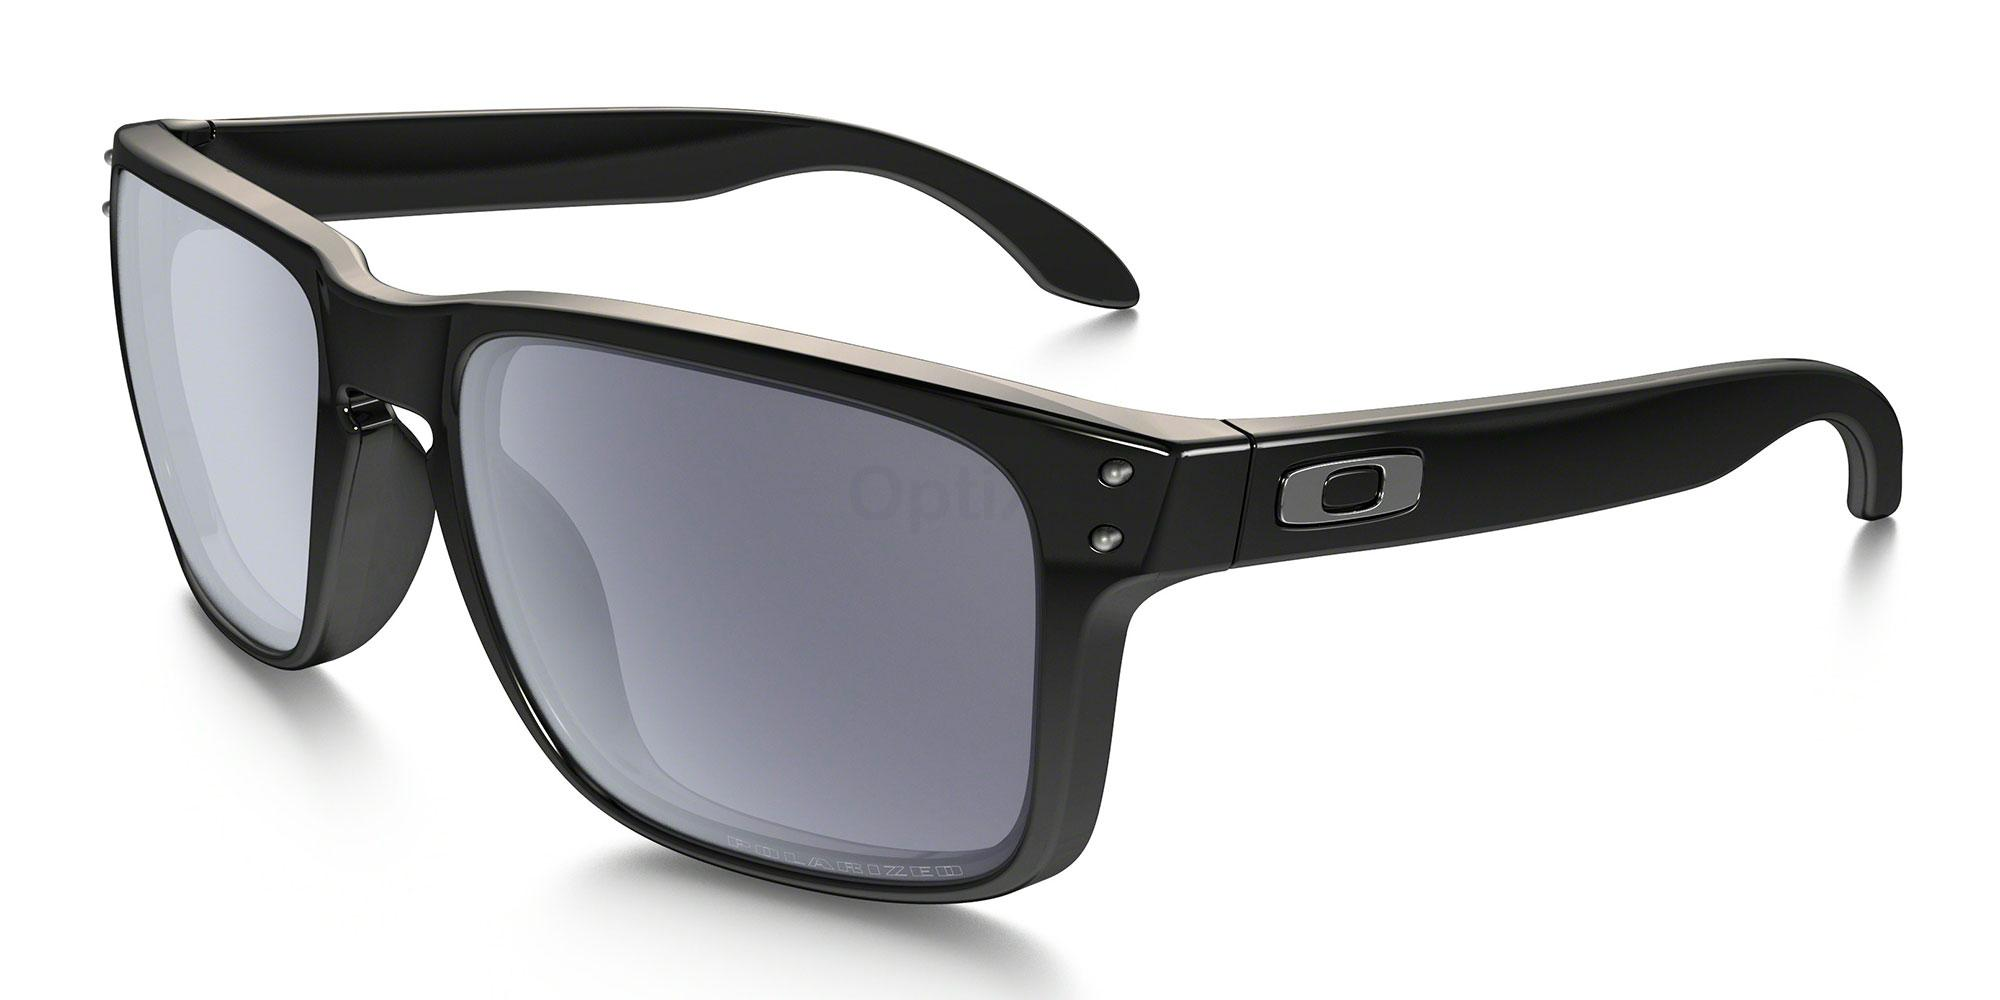 910202 OO9102 HOLBROOK (Polarized) Sunglasses, Oakley